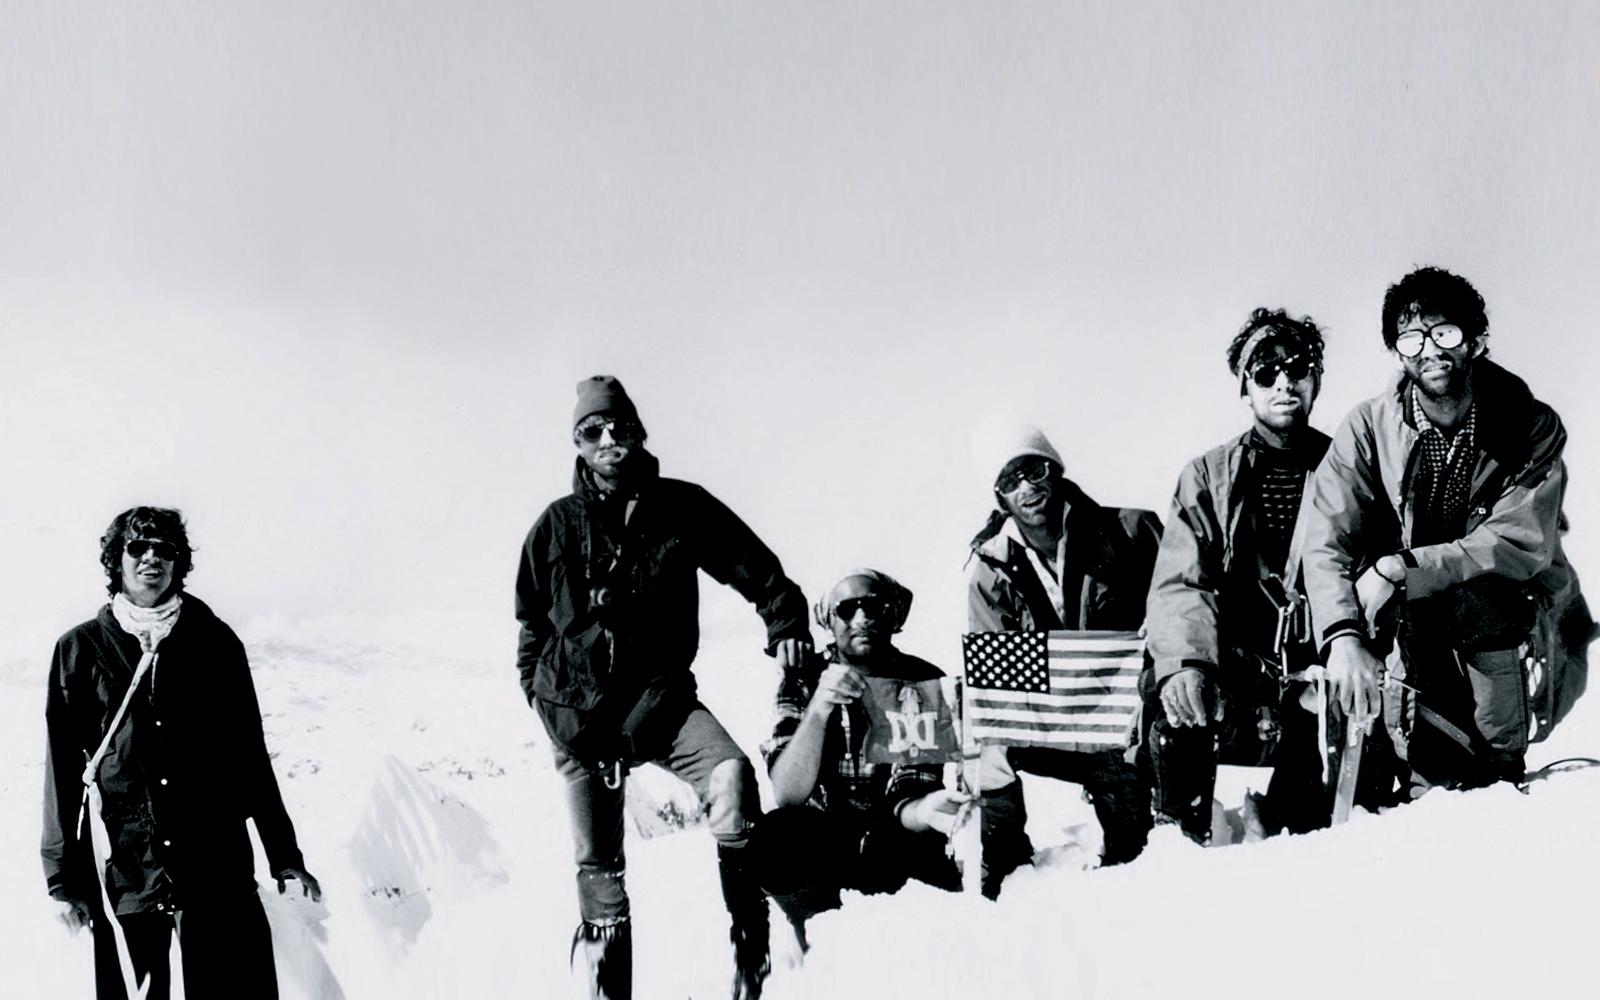 At the summit, finally, in May 1978 (l-r):   Fritz Kaeser '80, Bill Dennis, Espen Brooks '77, Richard Wiggin '70, John Faraci '72, and John Phillips '75.